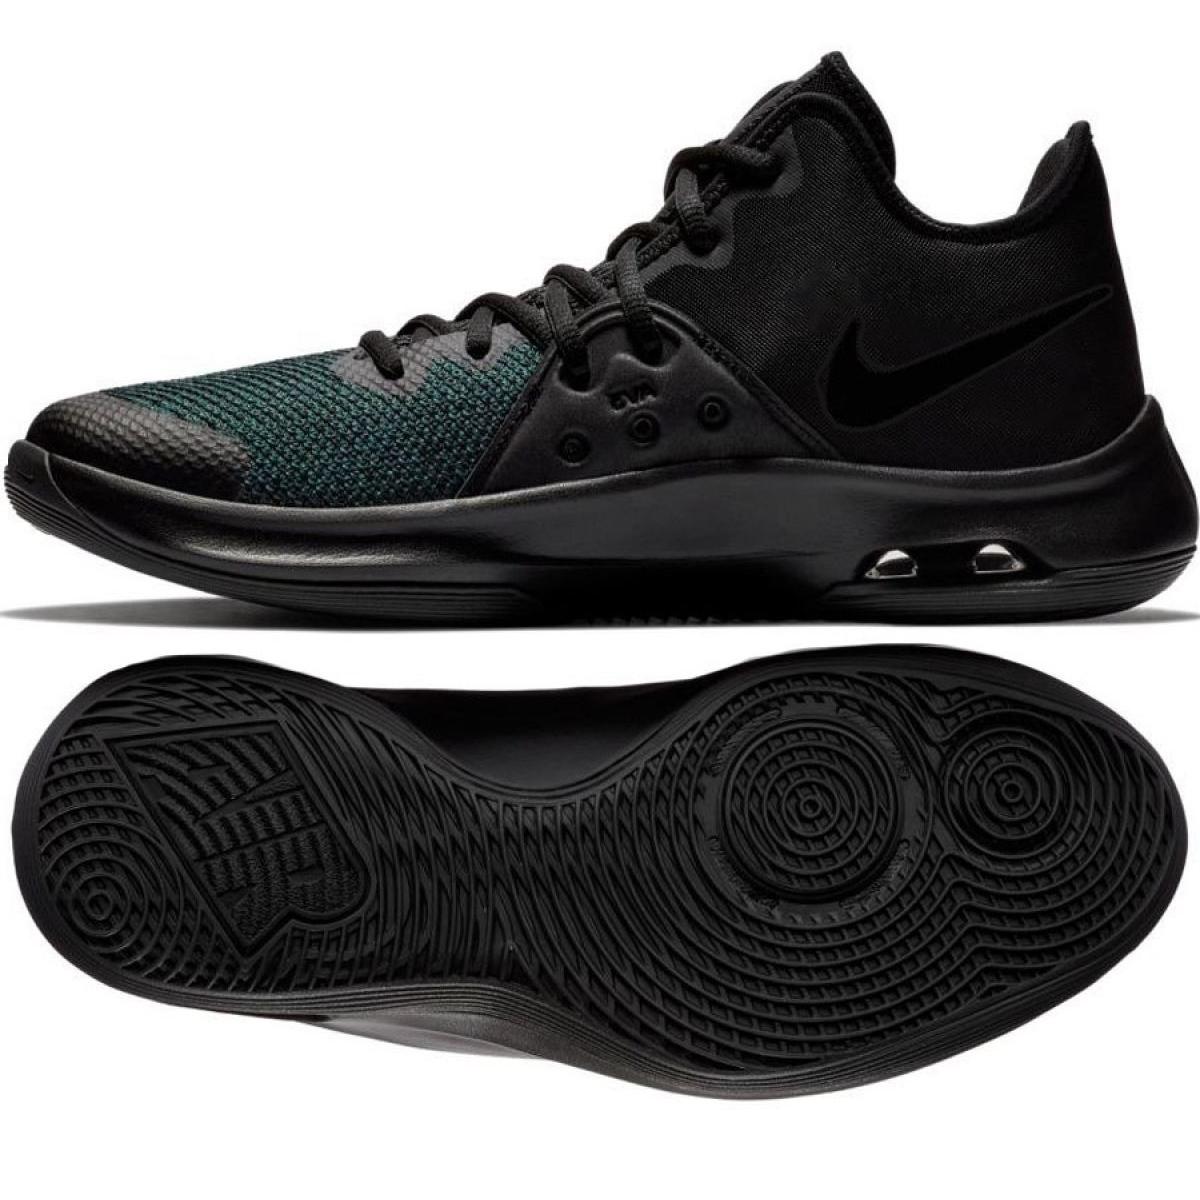 Tênis de basquete Nike Air Versitile Iii M AO4430 002 preto preto